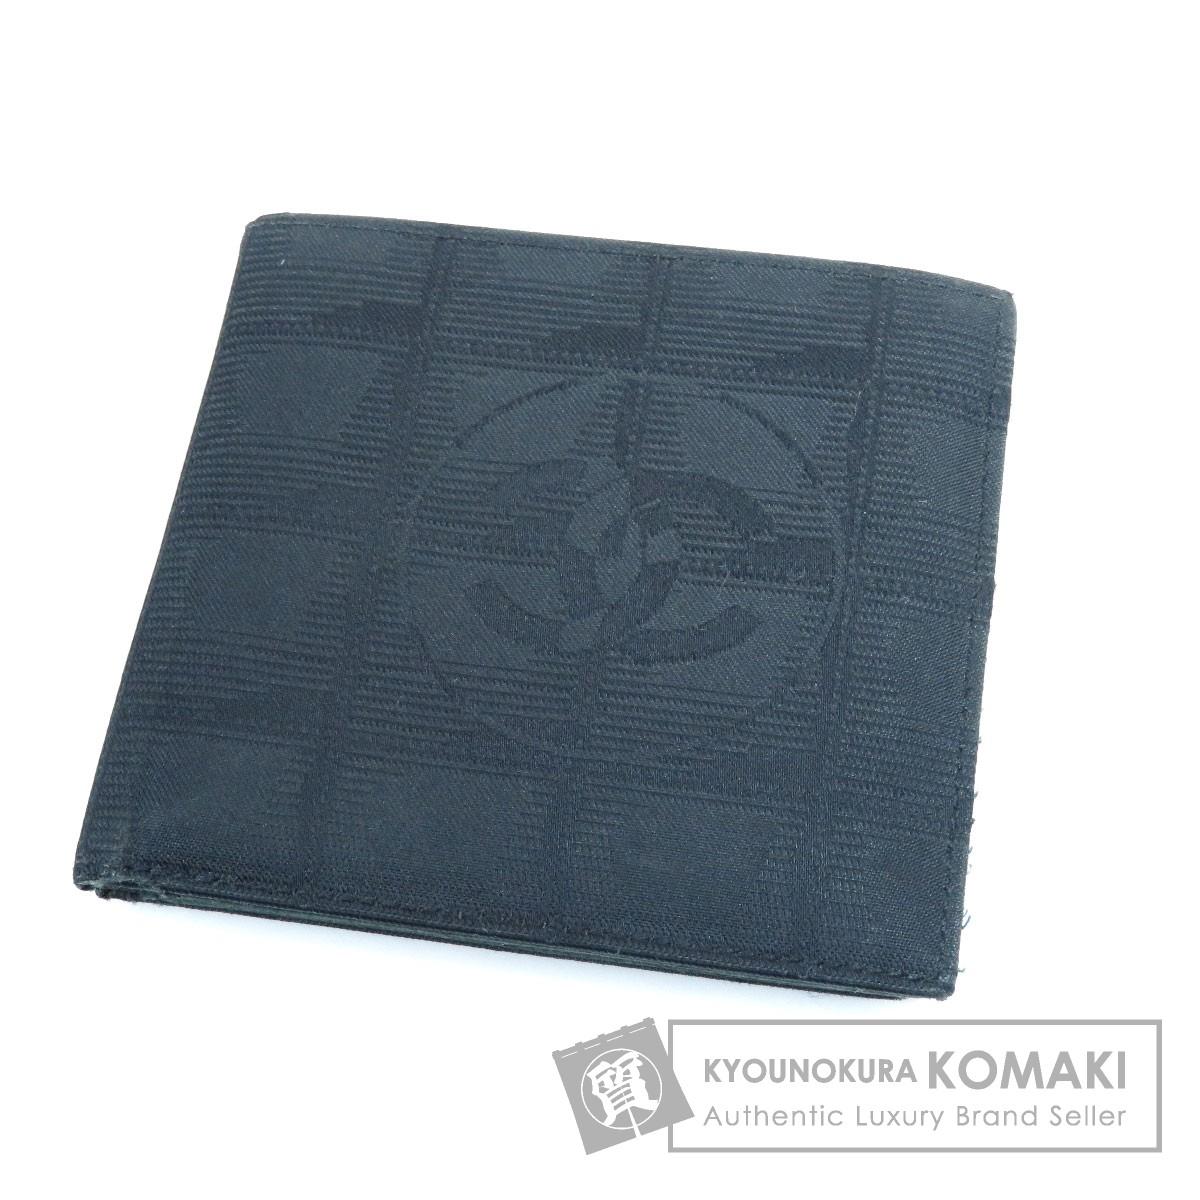 a98f823131b0 CHANEL ニュートラベルライン 二つ折り財布(小銭入れあり) ナイロン素材 レディース 【